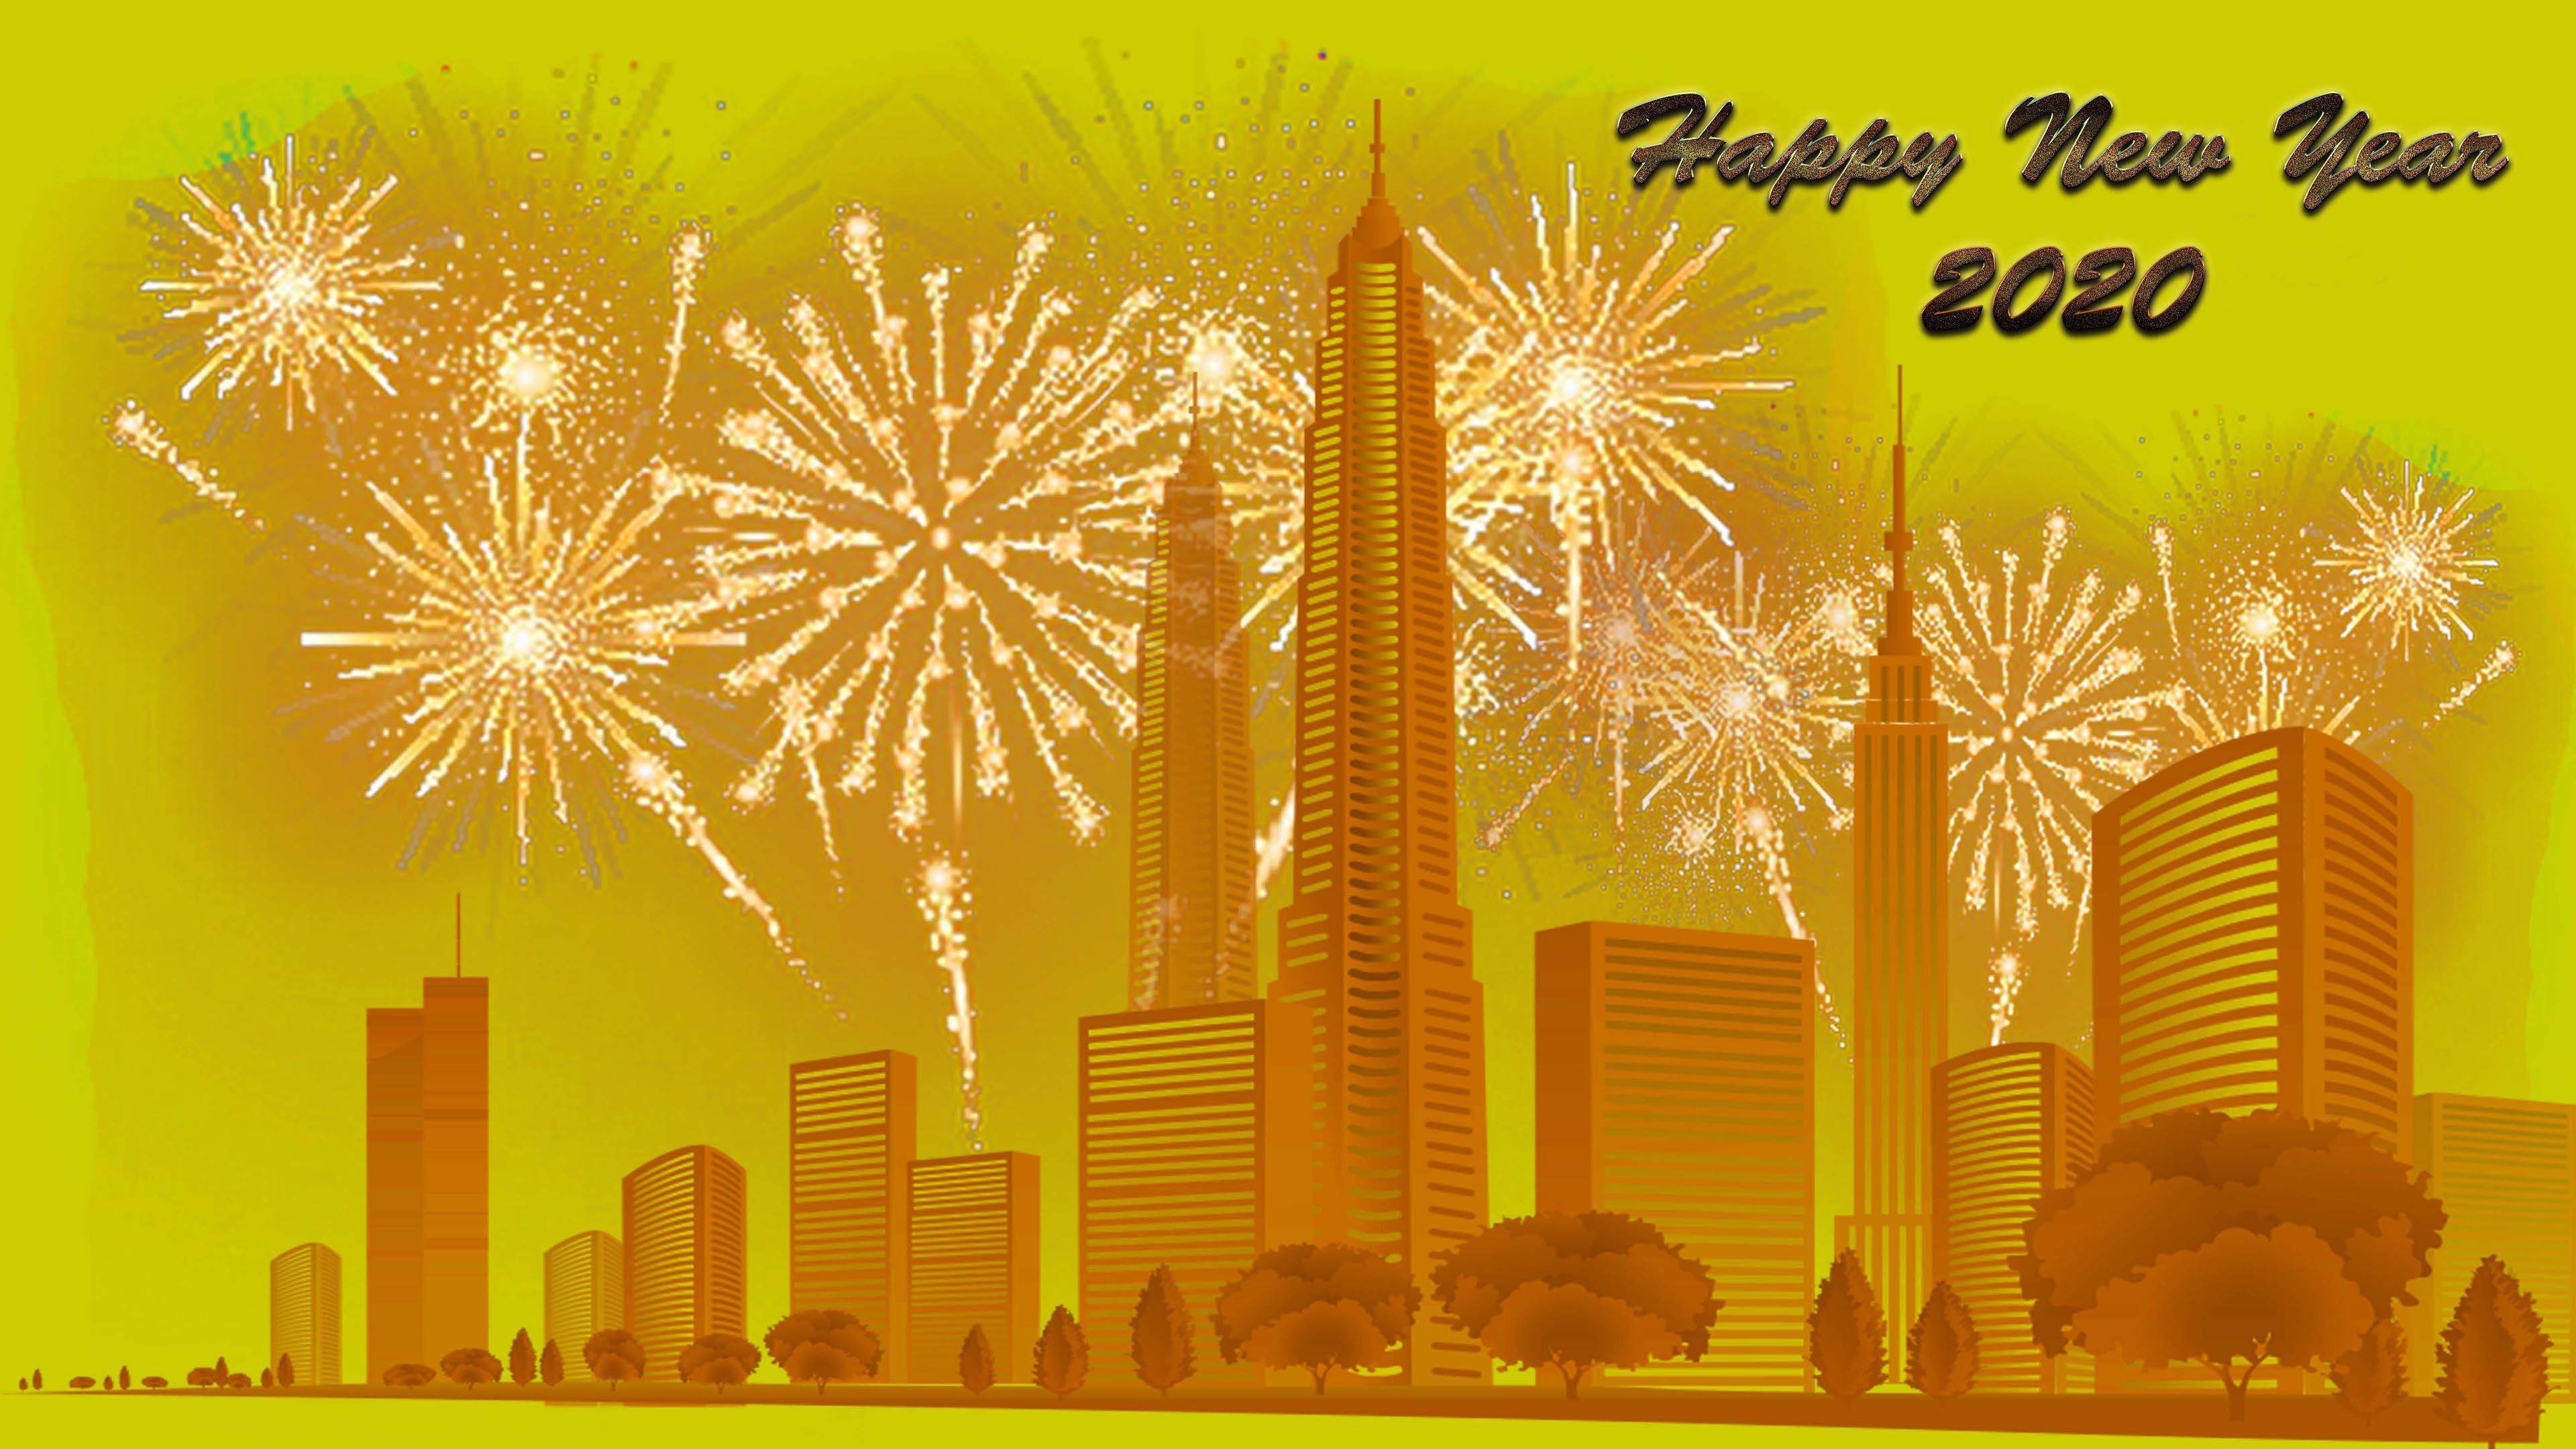 Happy New Year 2020 City Buildings Fireworks 4k Ultra Hd Tv 3840x2160